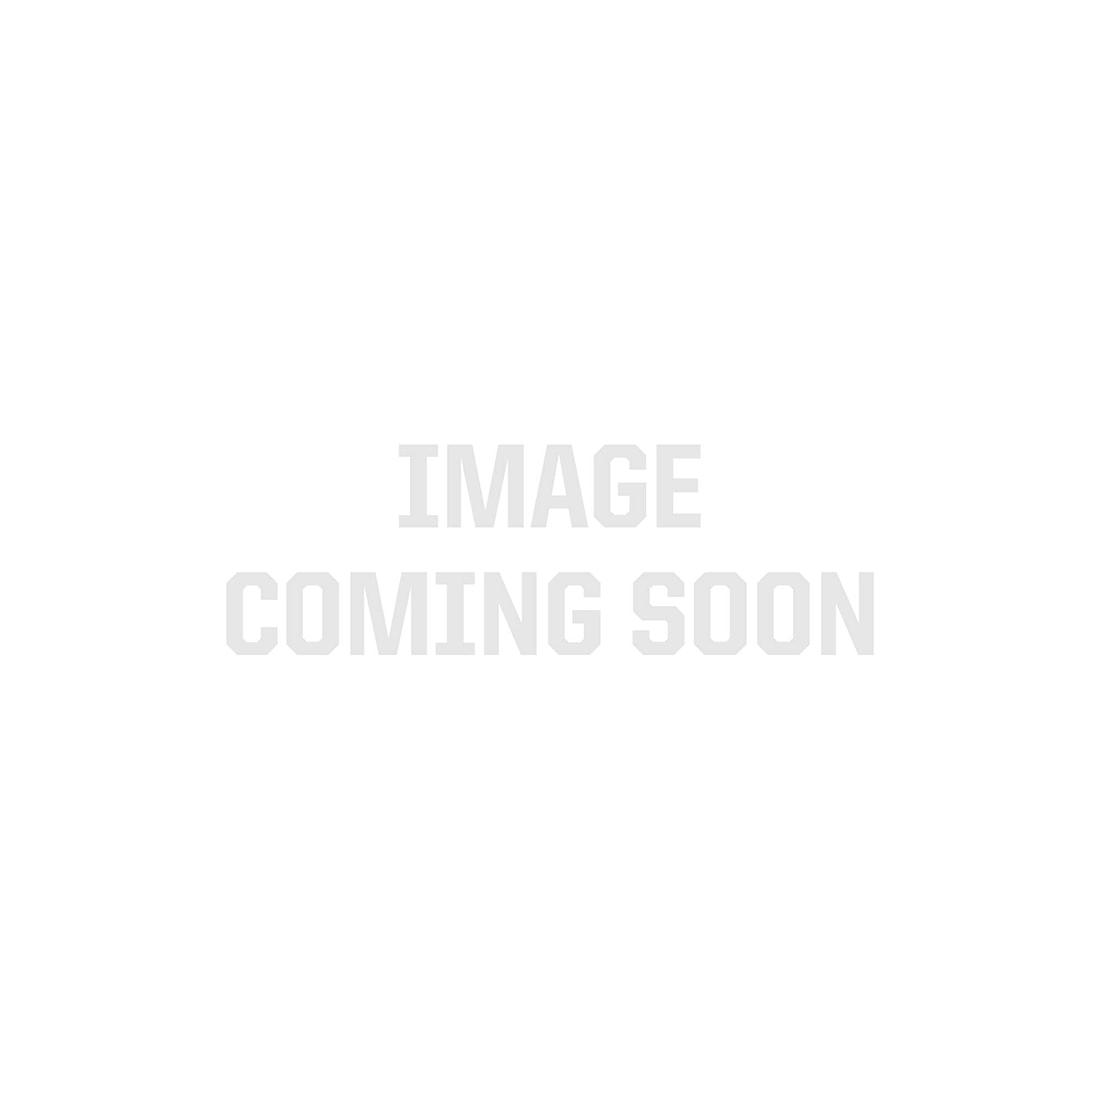 Klus EX-ALU Aluminum Channel for Edge Lighting (Non-anodized)